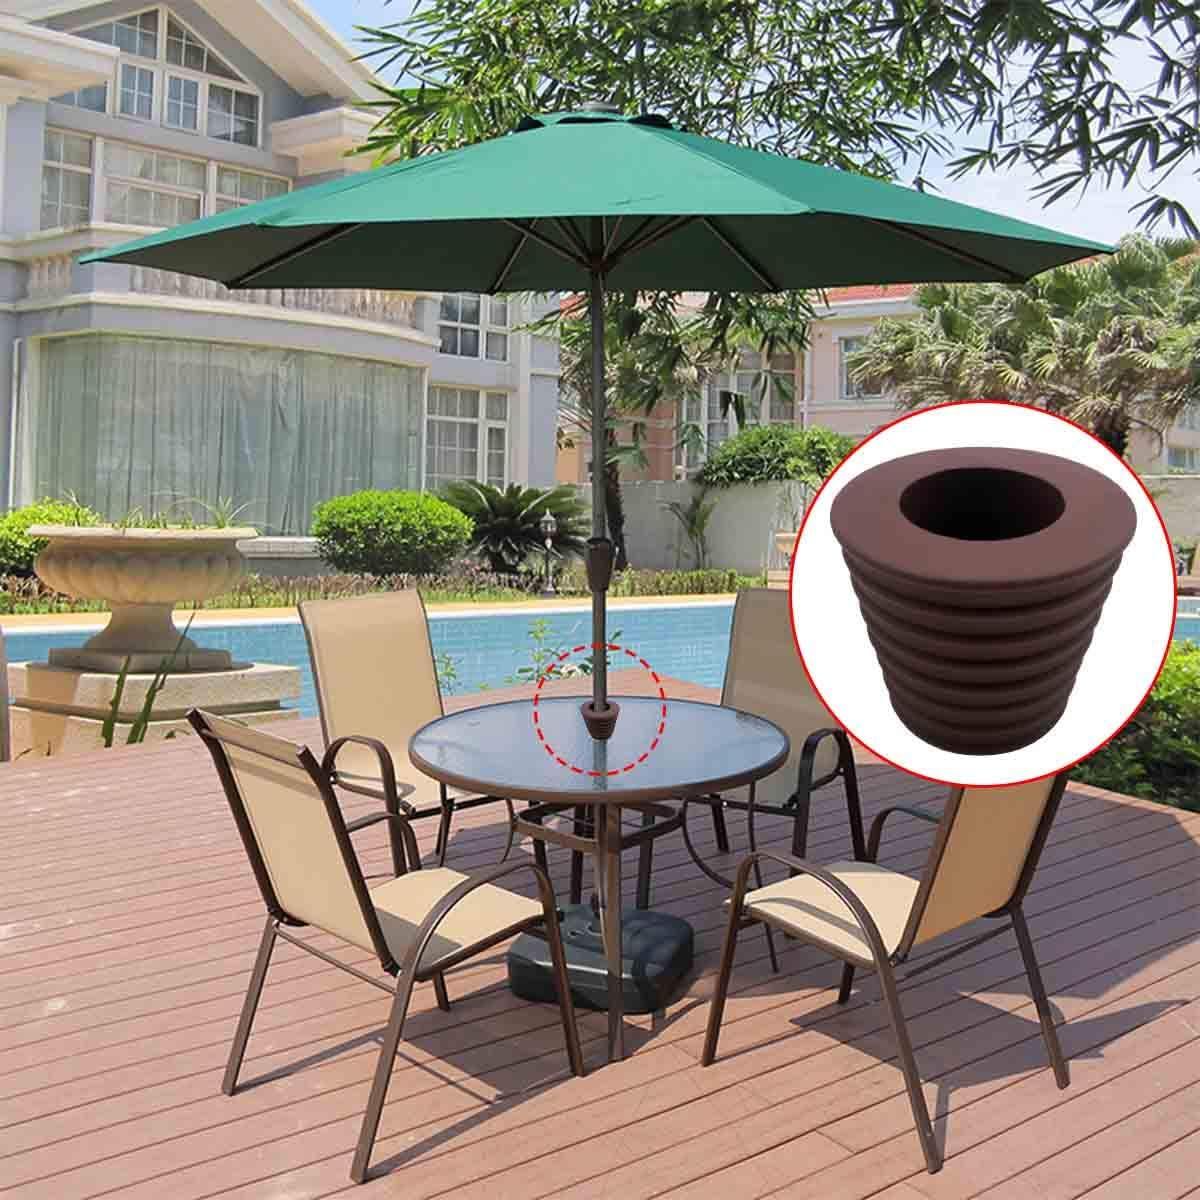 Diriway Umbrella Wedge Patio Opening or Parasol Base Bracket 1.8 to 2.4 Inch 38 mm Mast Diameter 1 1//2 Inch Brown 1pack